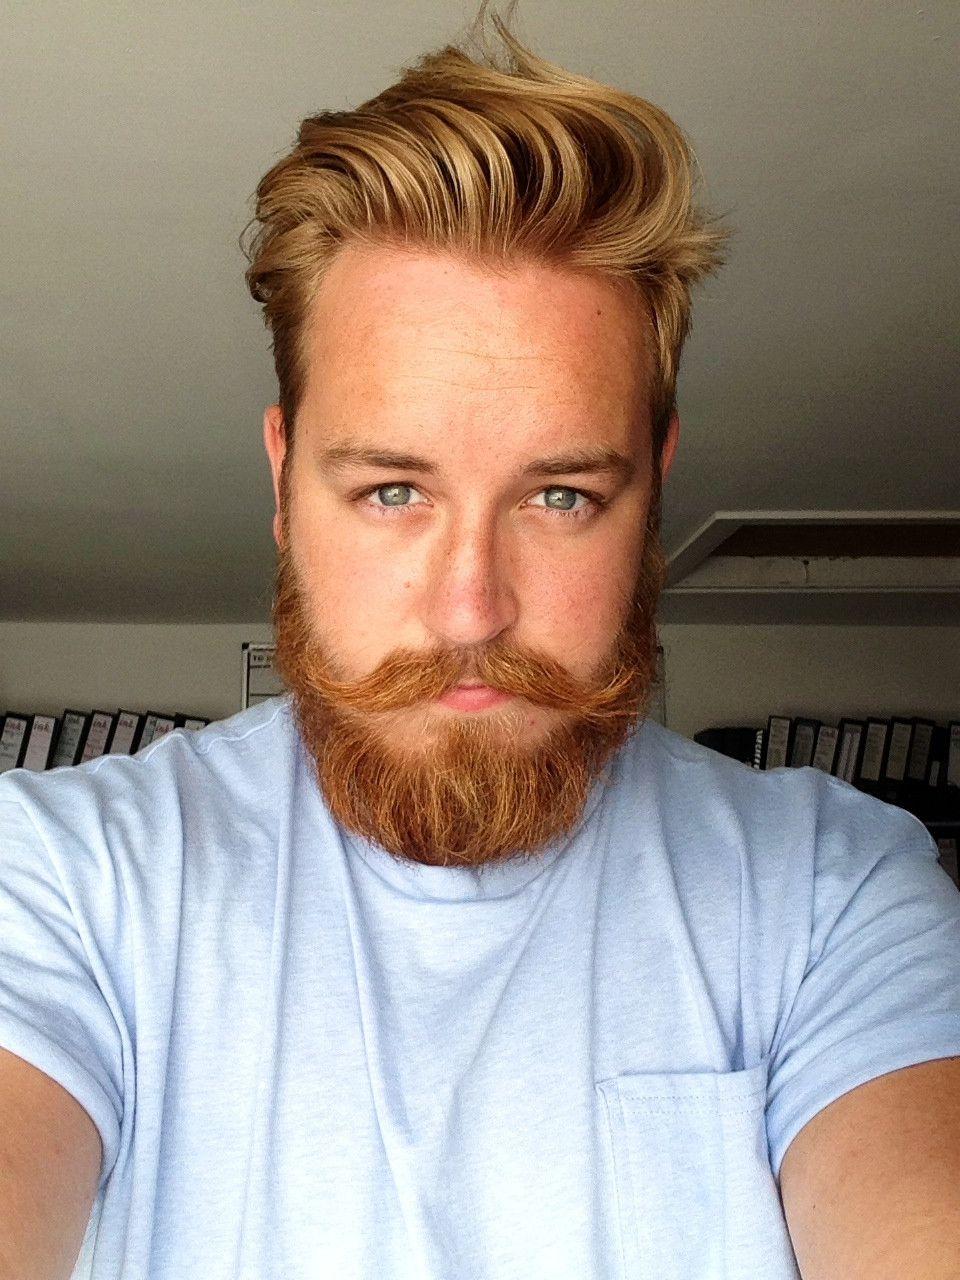 went to spain for a week, hair got blonder, beard still resolutely